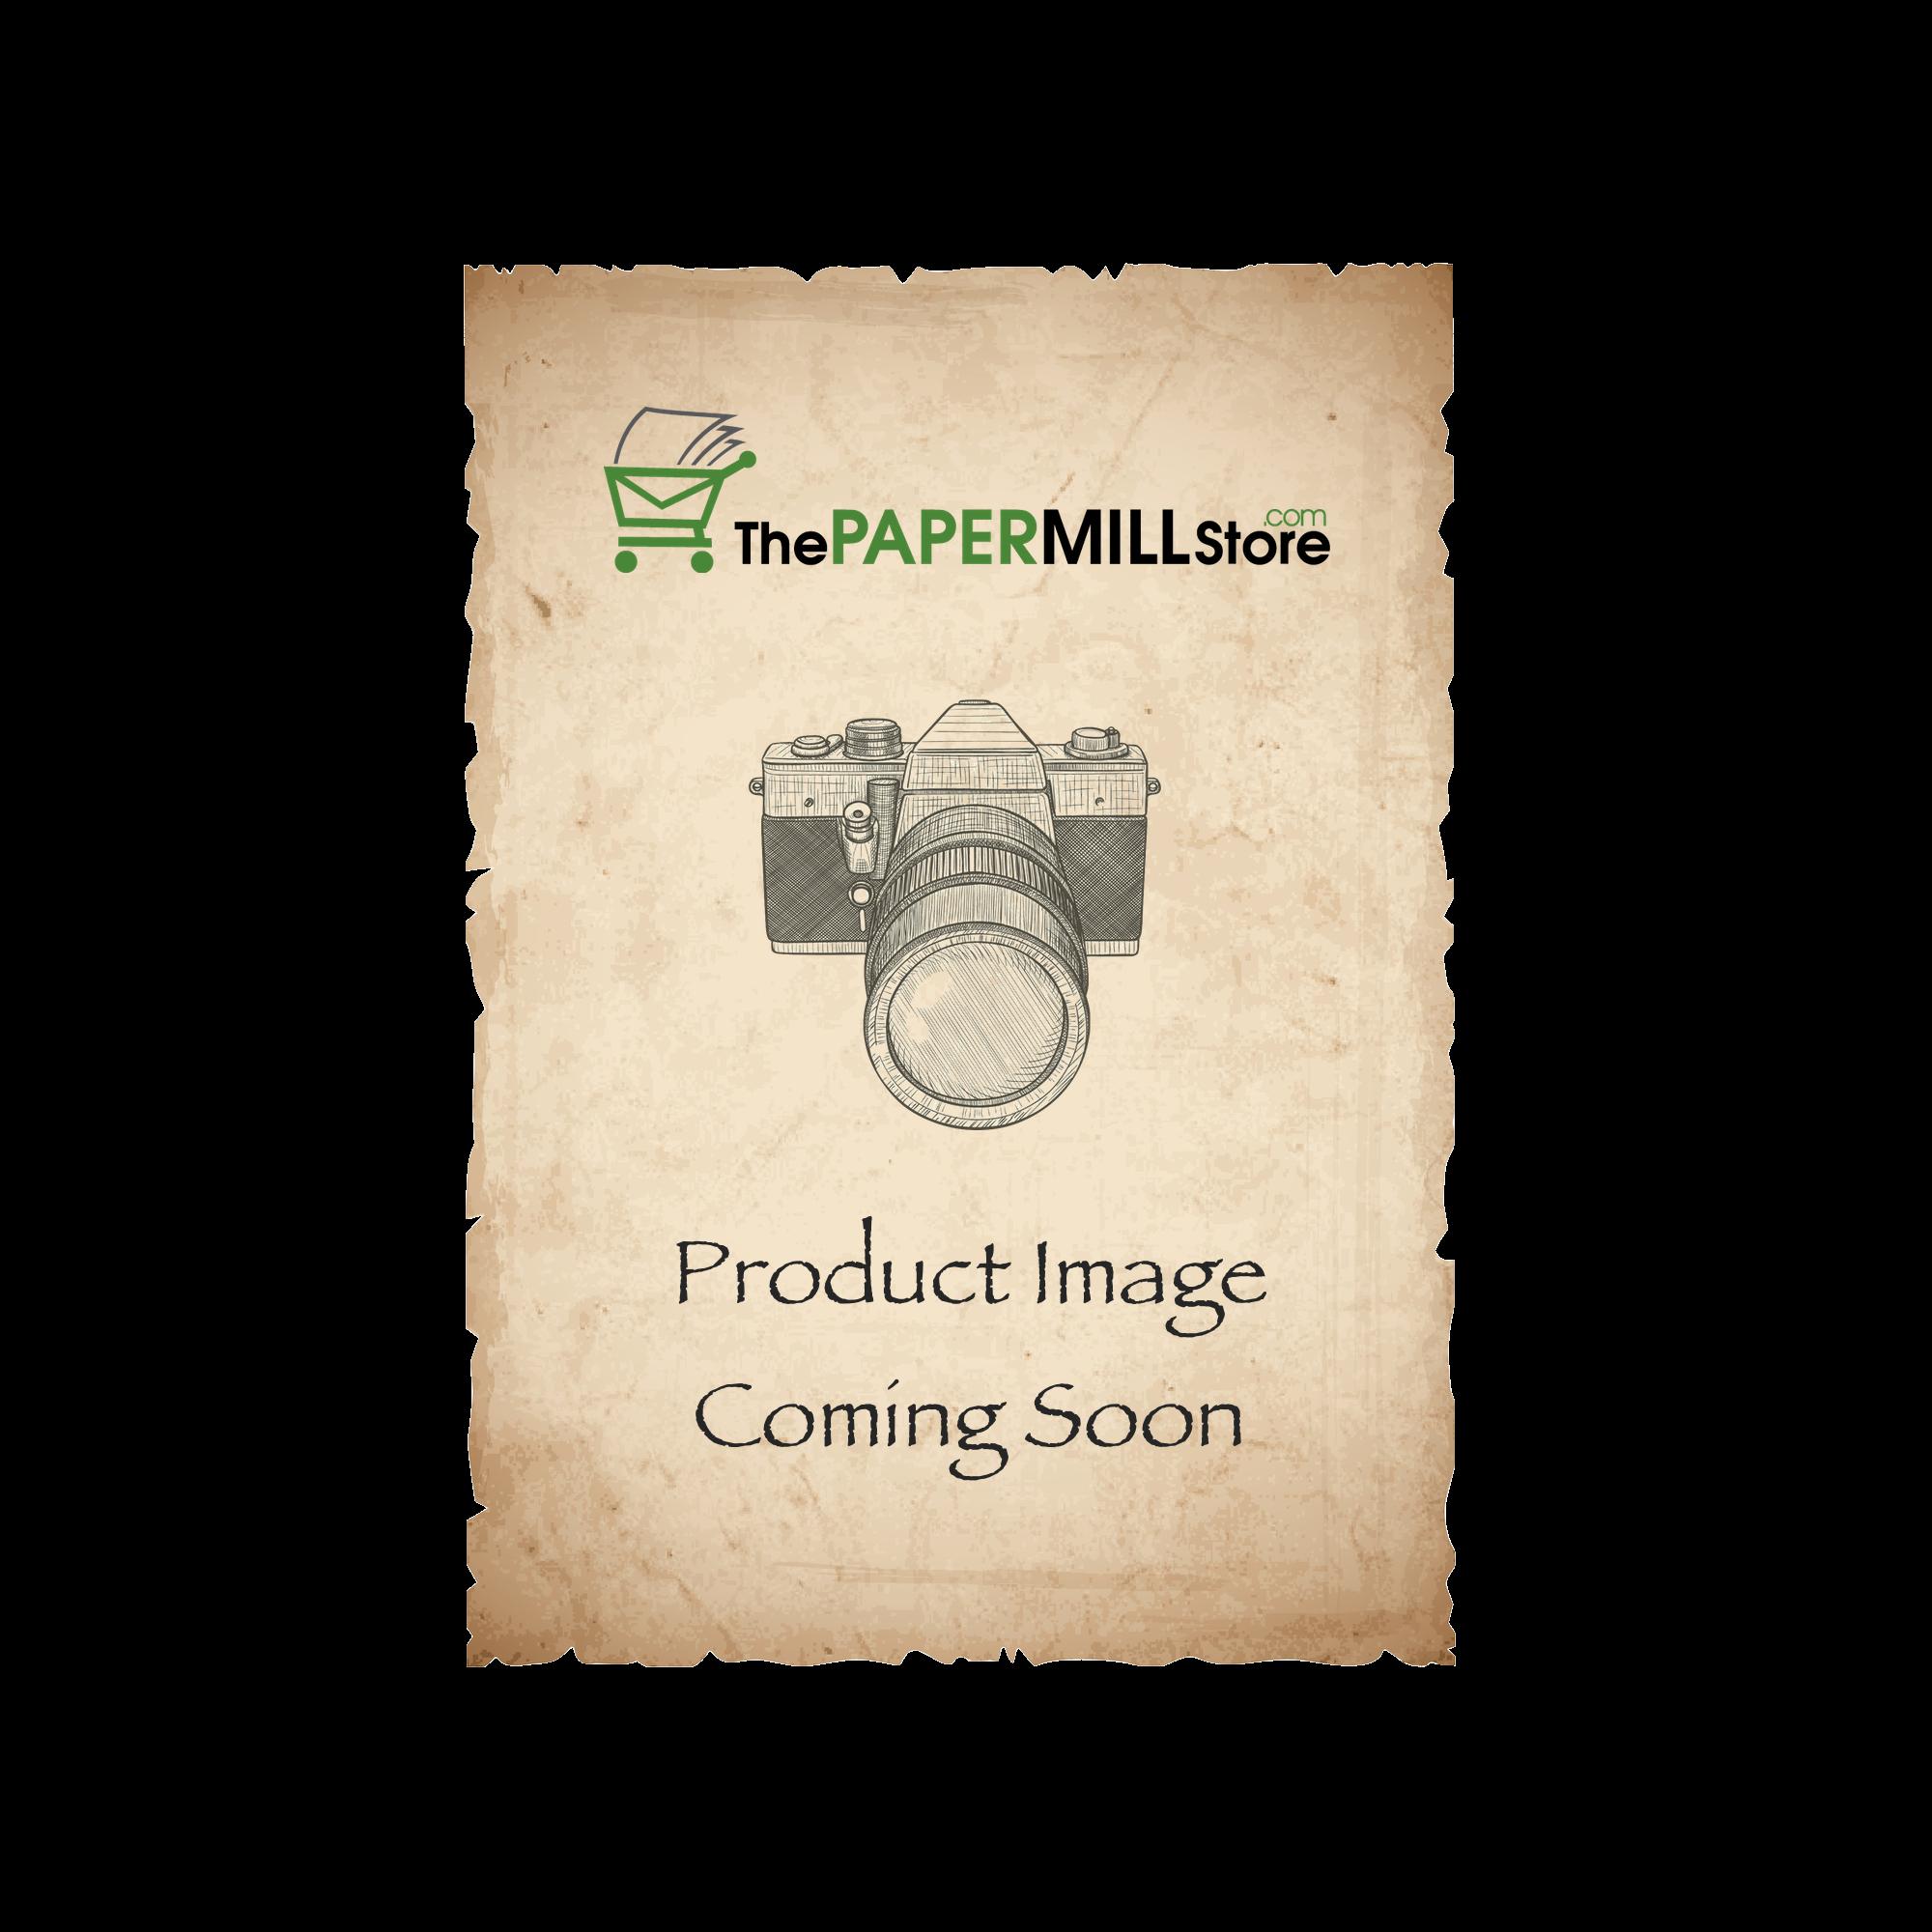 Exact Vellum Bristol Green Paper - 11 x 17 in 67 lb Bristol Vellum 250 per Package